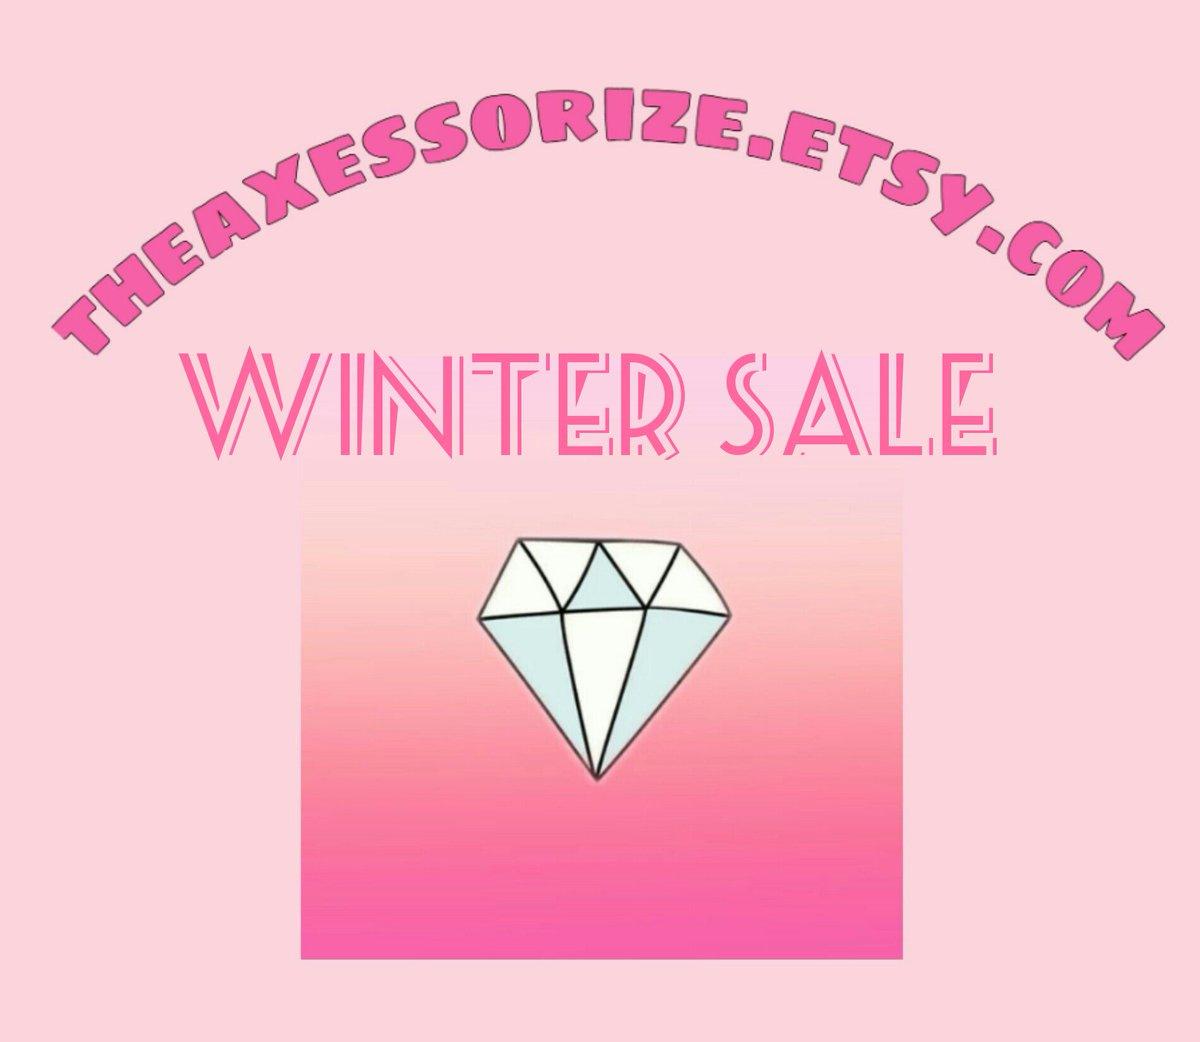 Well hello there #SundayFunday let's #shop #Sales at #TheaXessorize #jewelryshop https://etsy.me/38mcVUq via @Etsy #etsy #handmade #jewelry #shopping #EtsySocial #womaninbiz #etsysale #handmadehour #weekend #CraftBizParty #SmallBiz #blogger #style #ValentinesDay #gifts @BlazedRTs